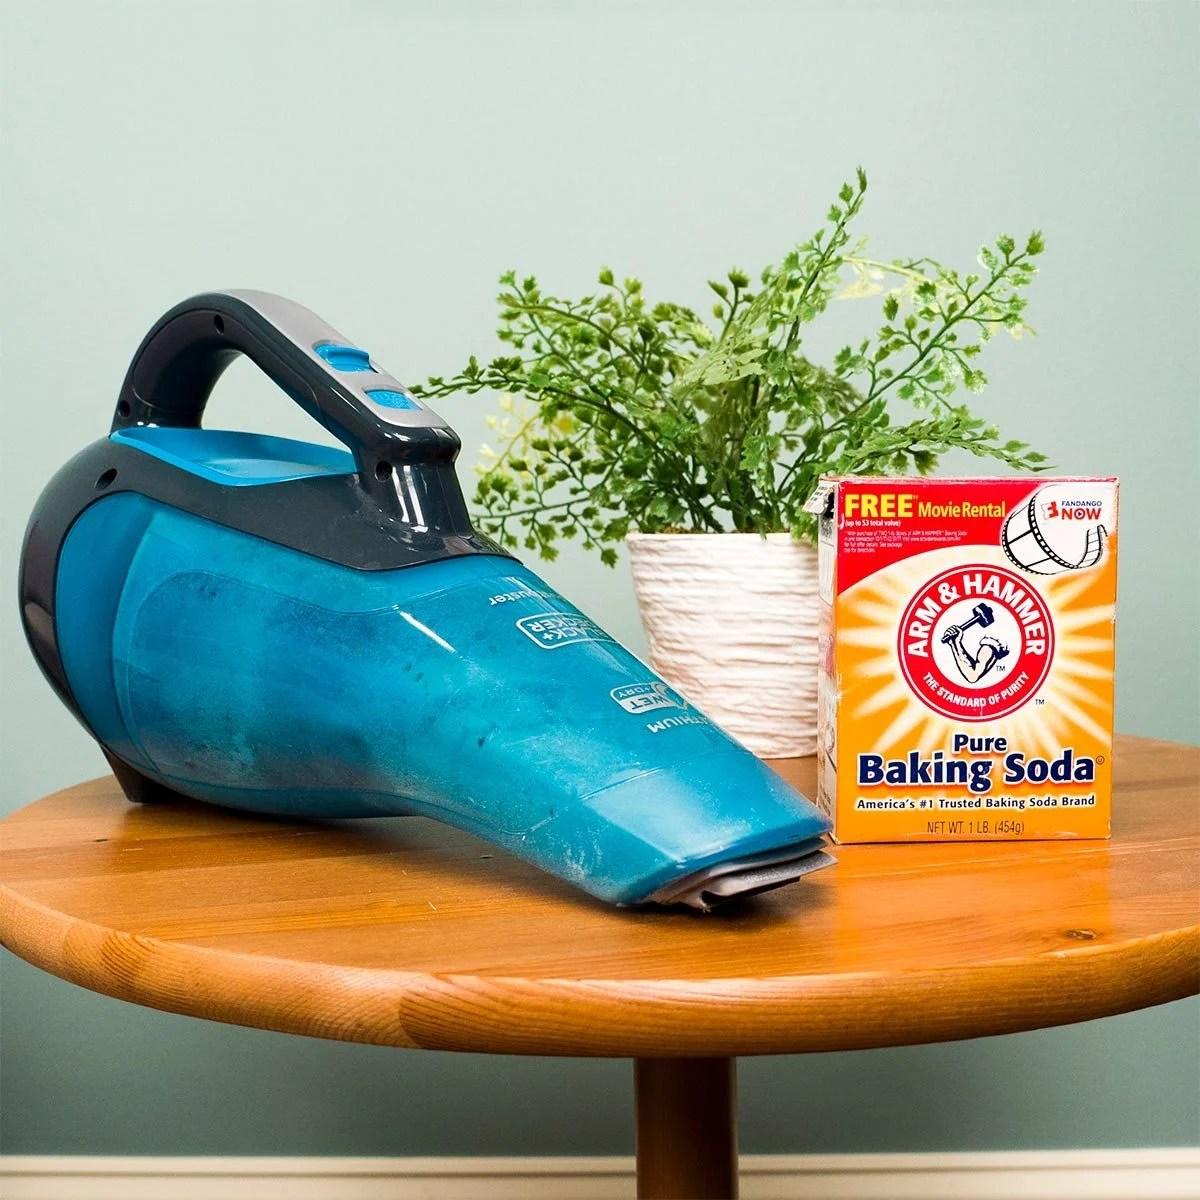 clean sofa with baking soda sofascore chelsea vs watford upholstery  the family handyman